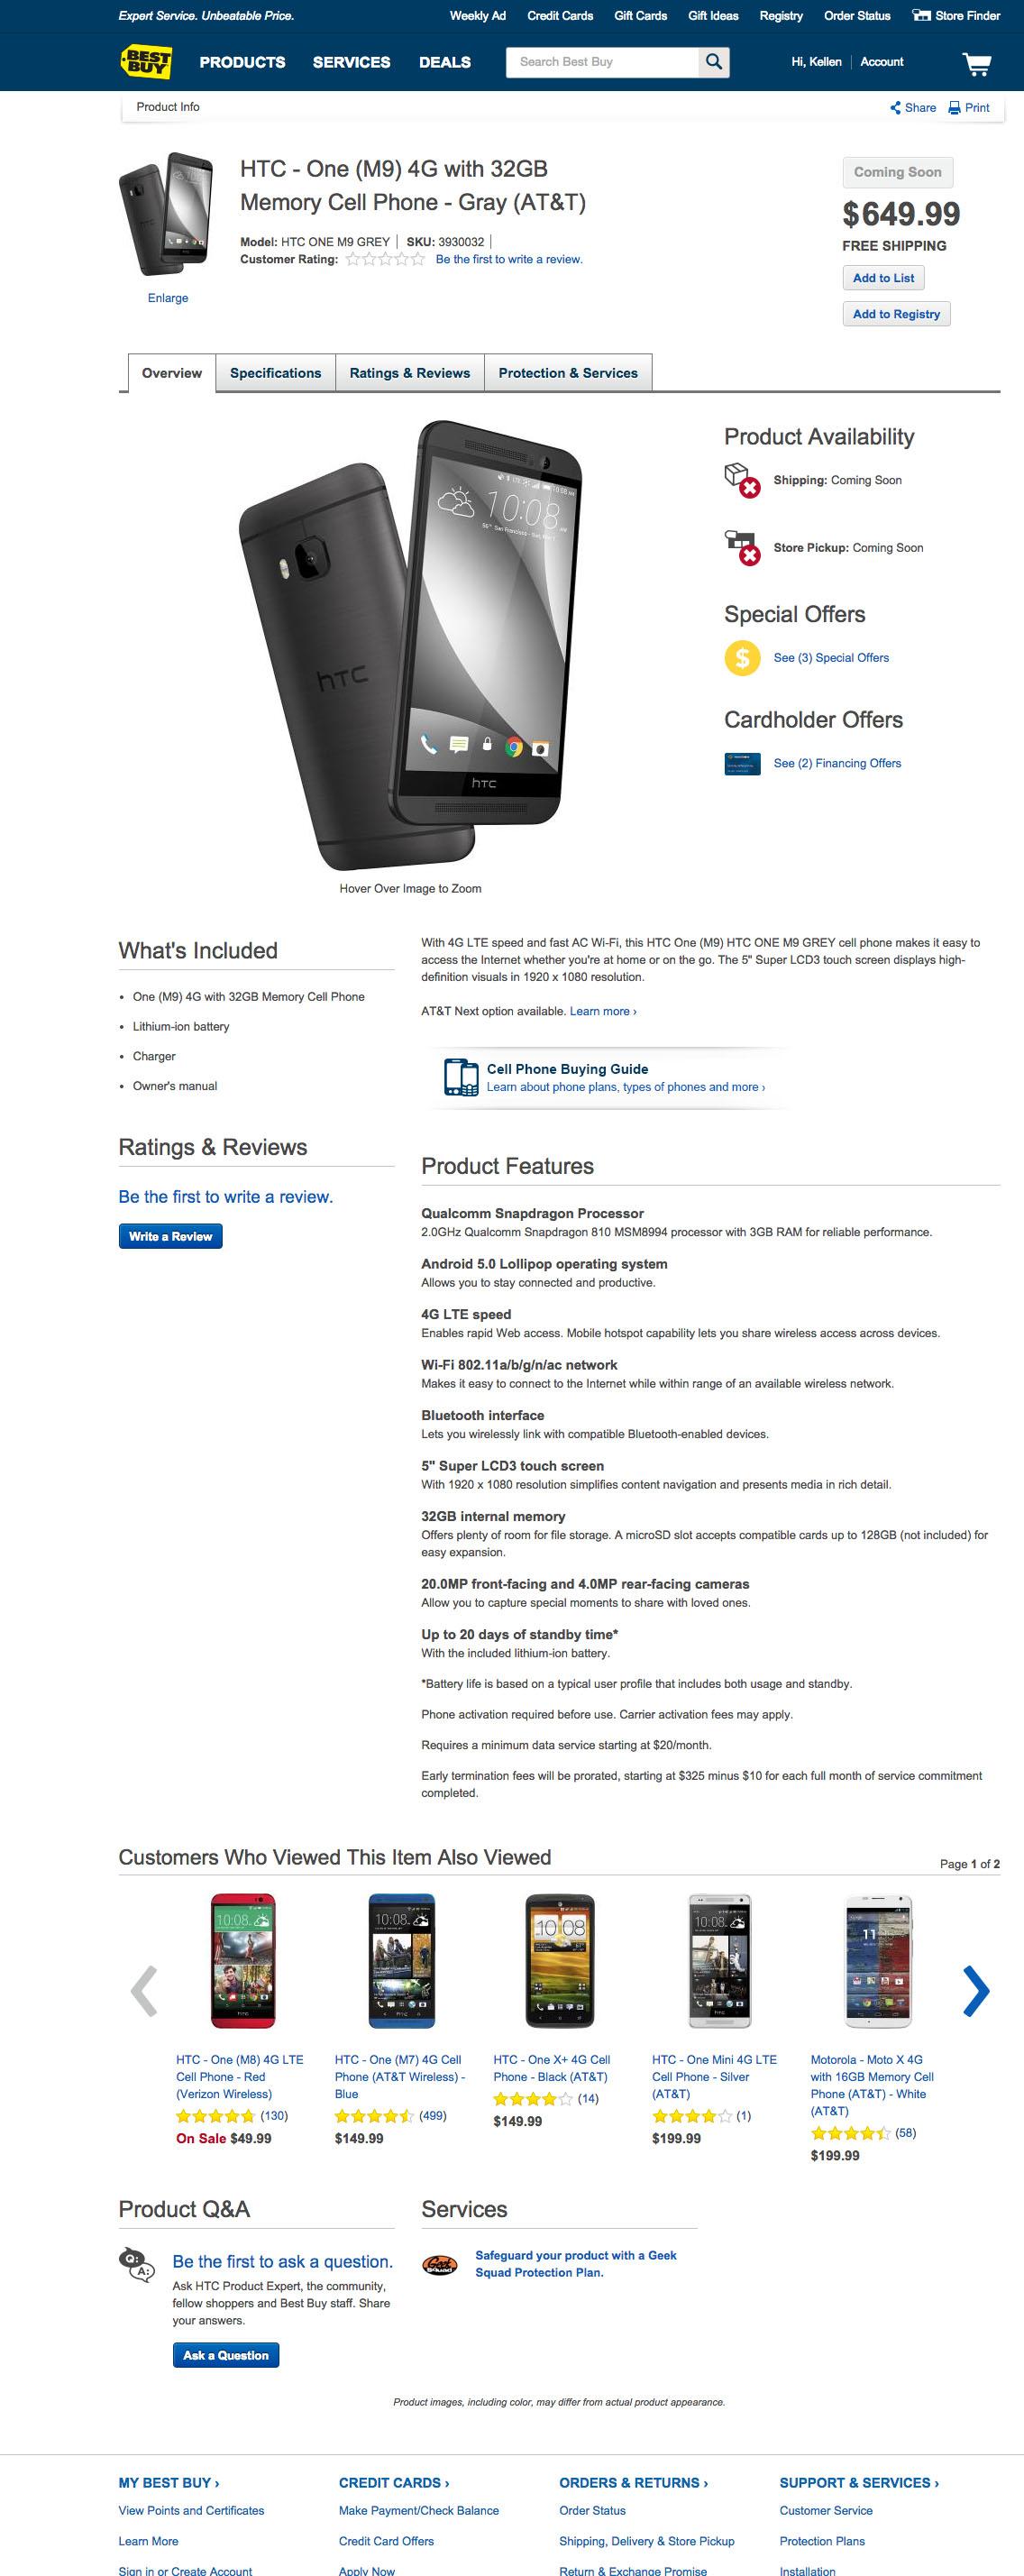 HTC One M9 Best Buy